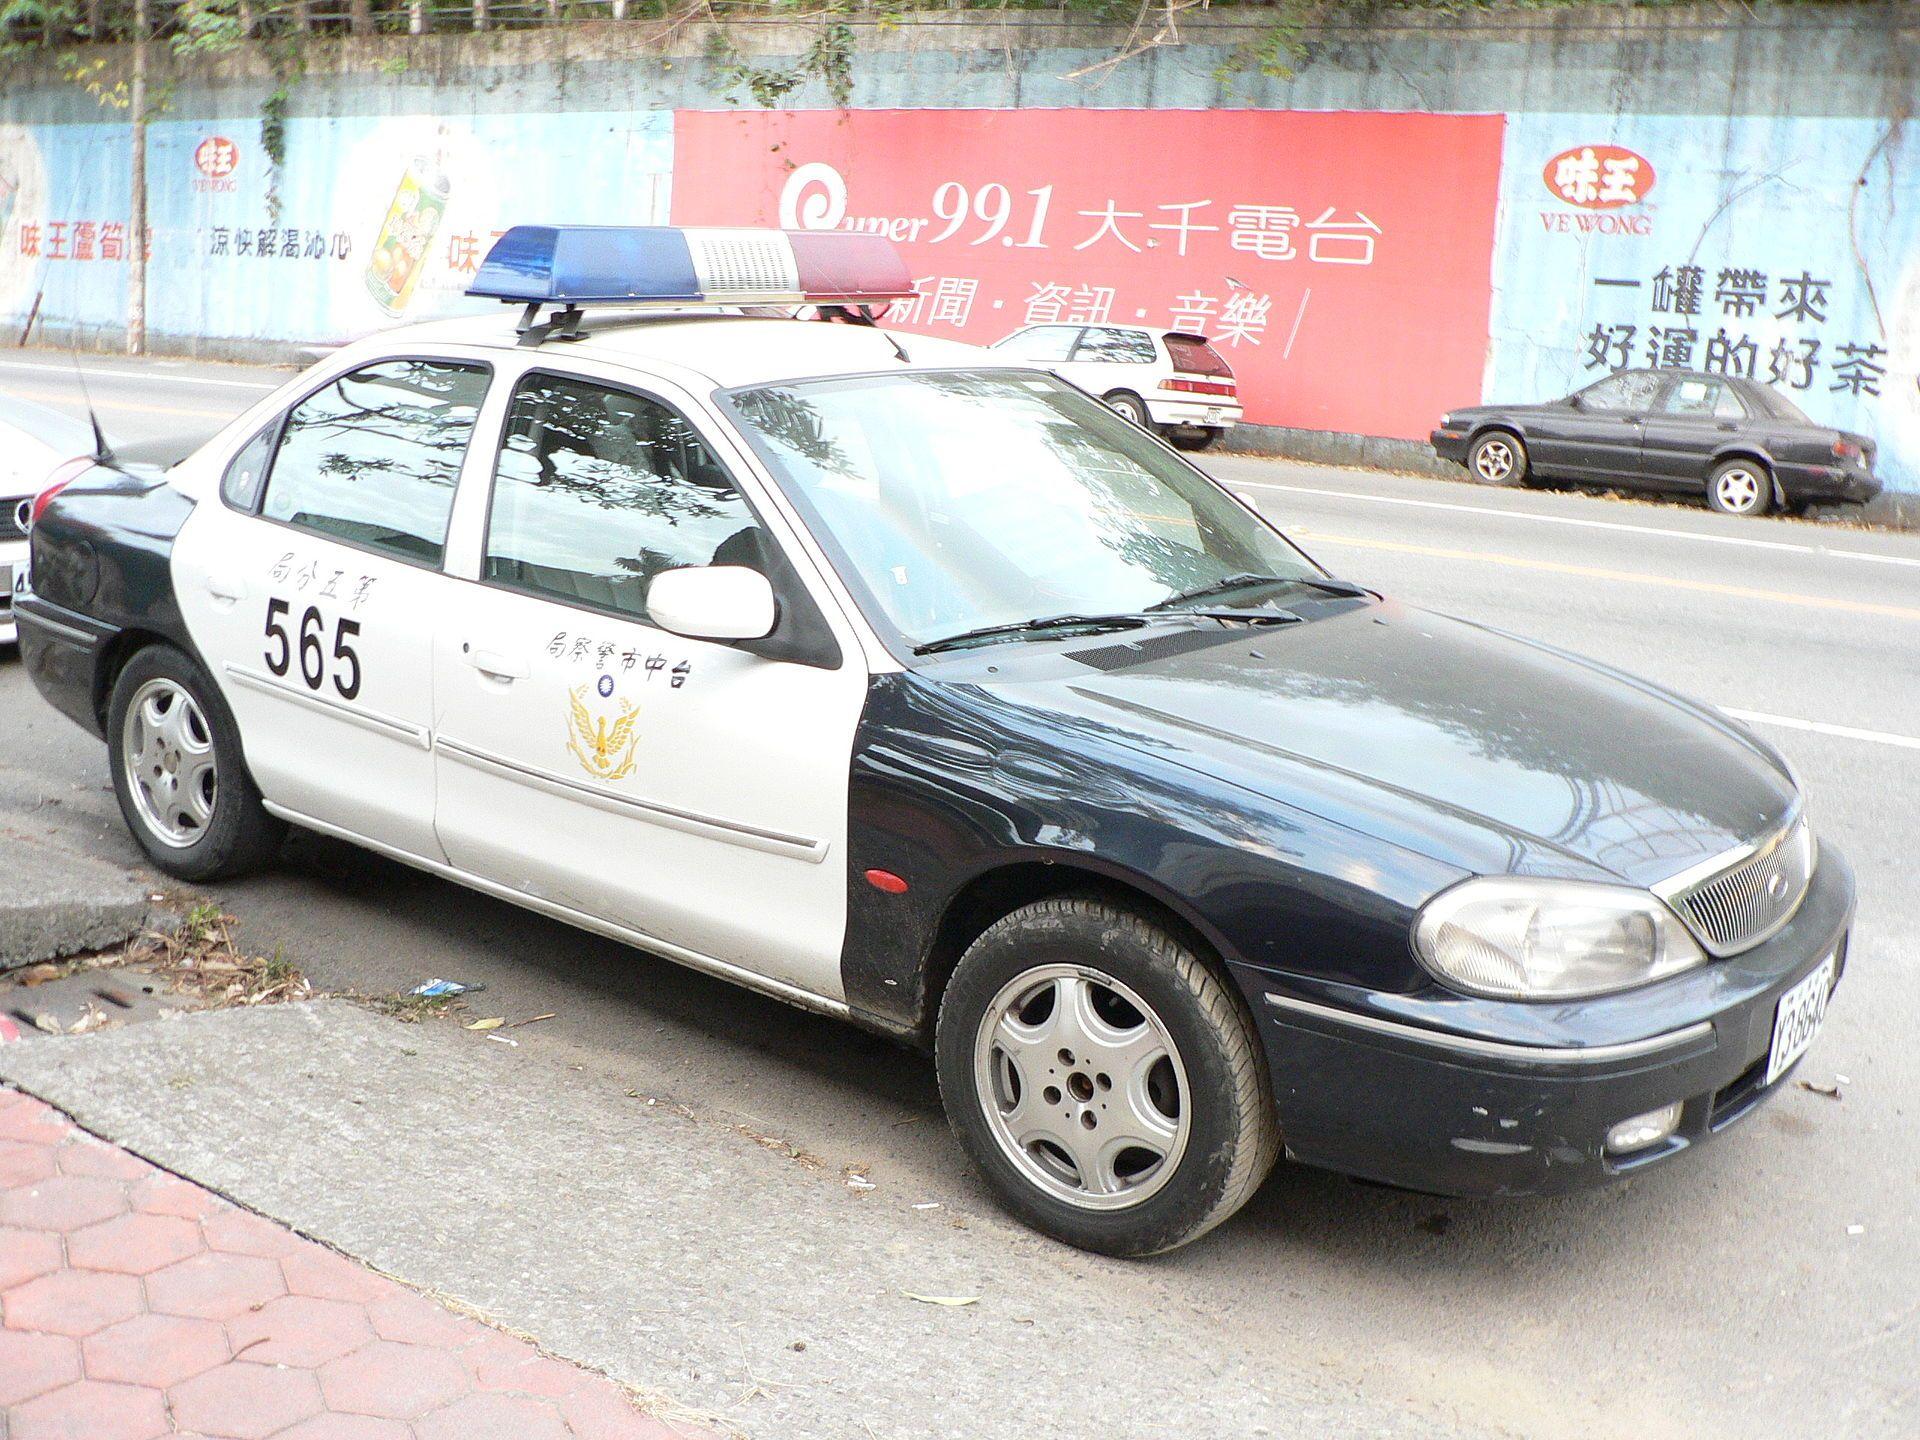 Idea By Manolo Godoy On Police Car Police Cars Car Insurance